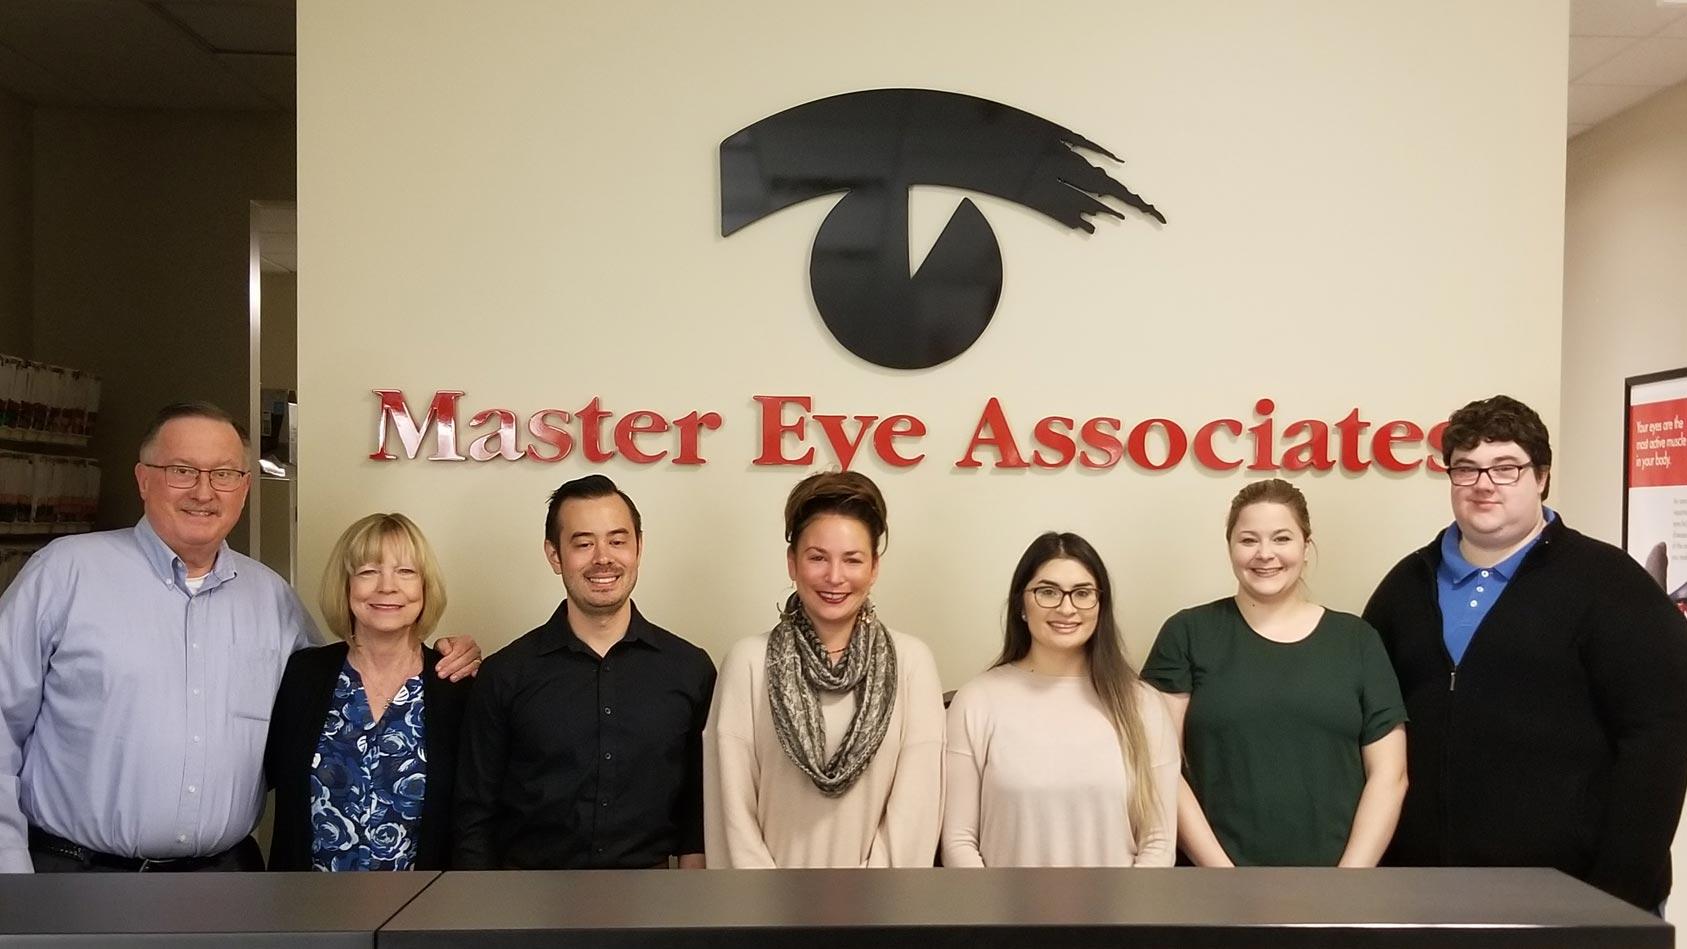 Master Eye Associates in Vancouver, WA